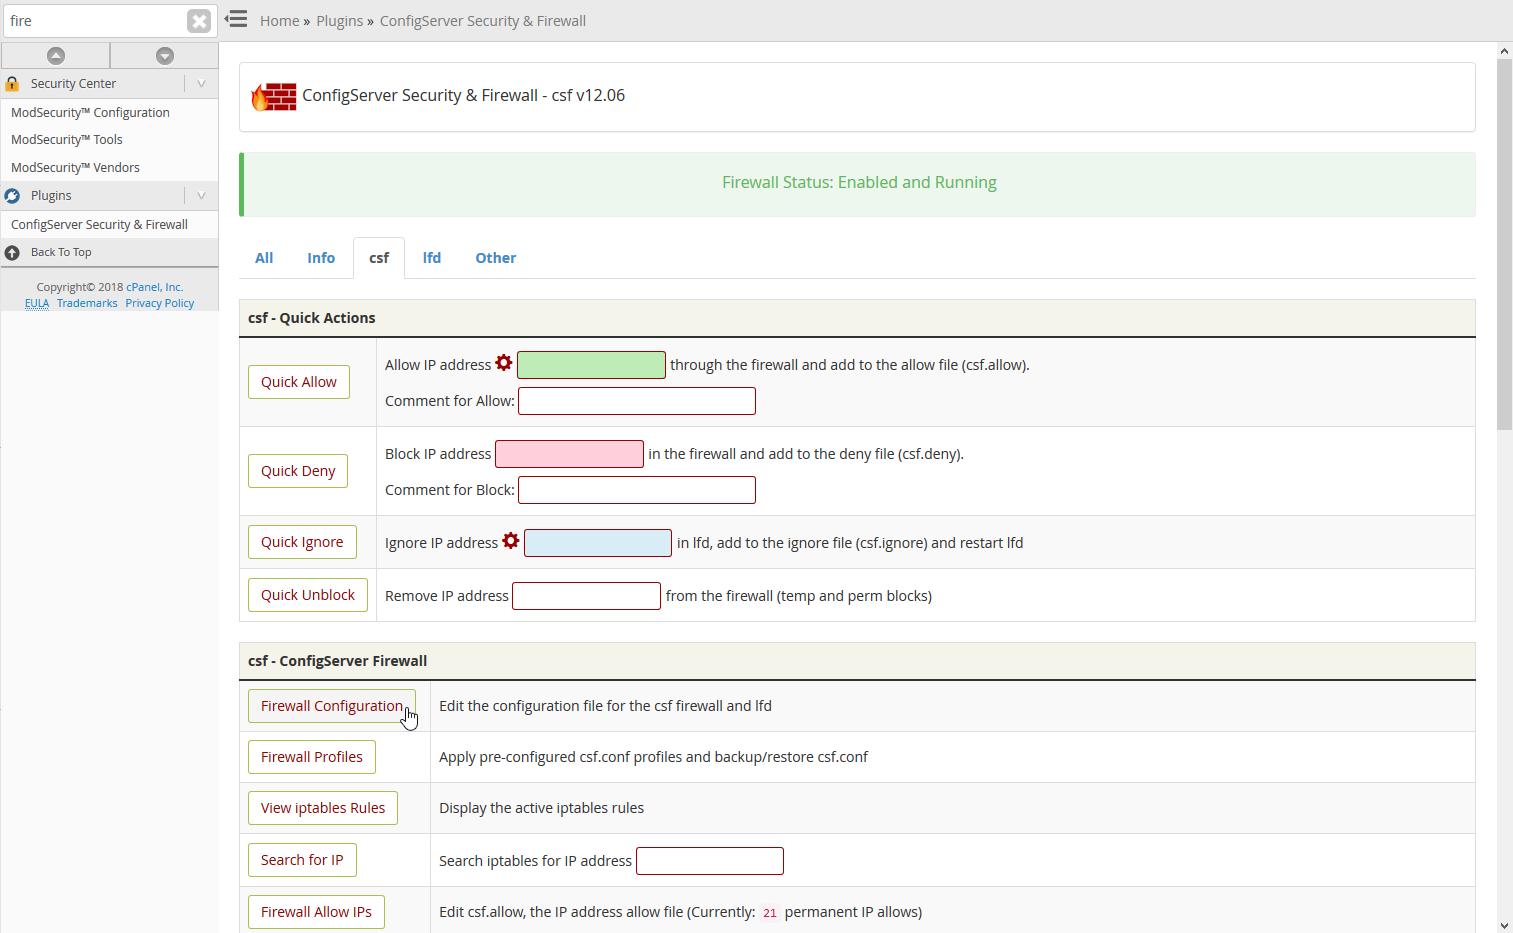 CSF selecting Firewall Configuration